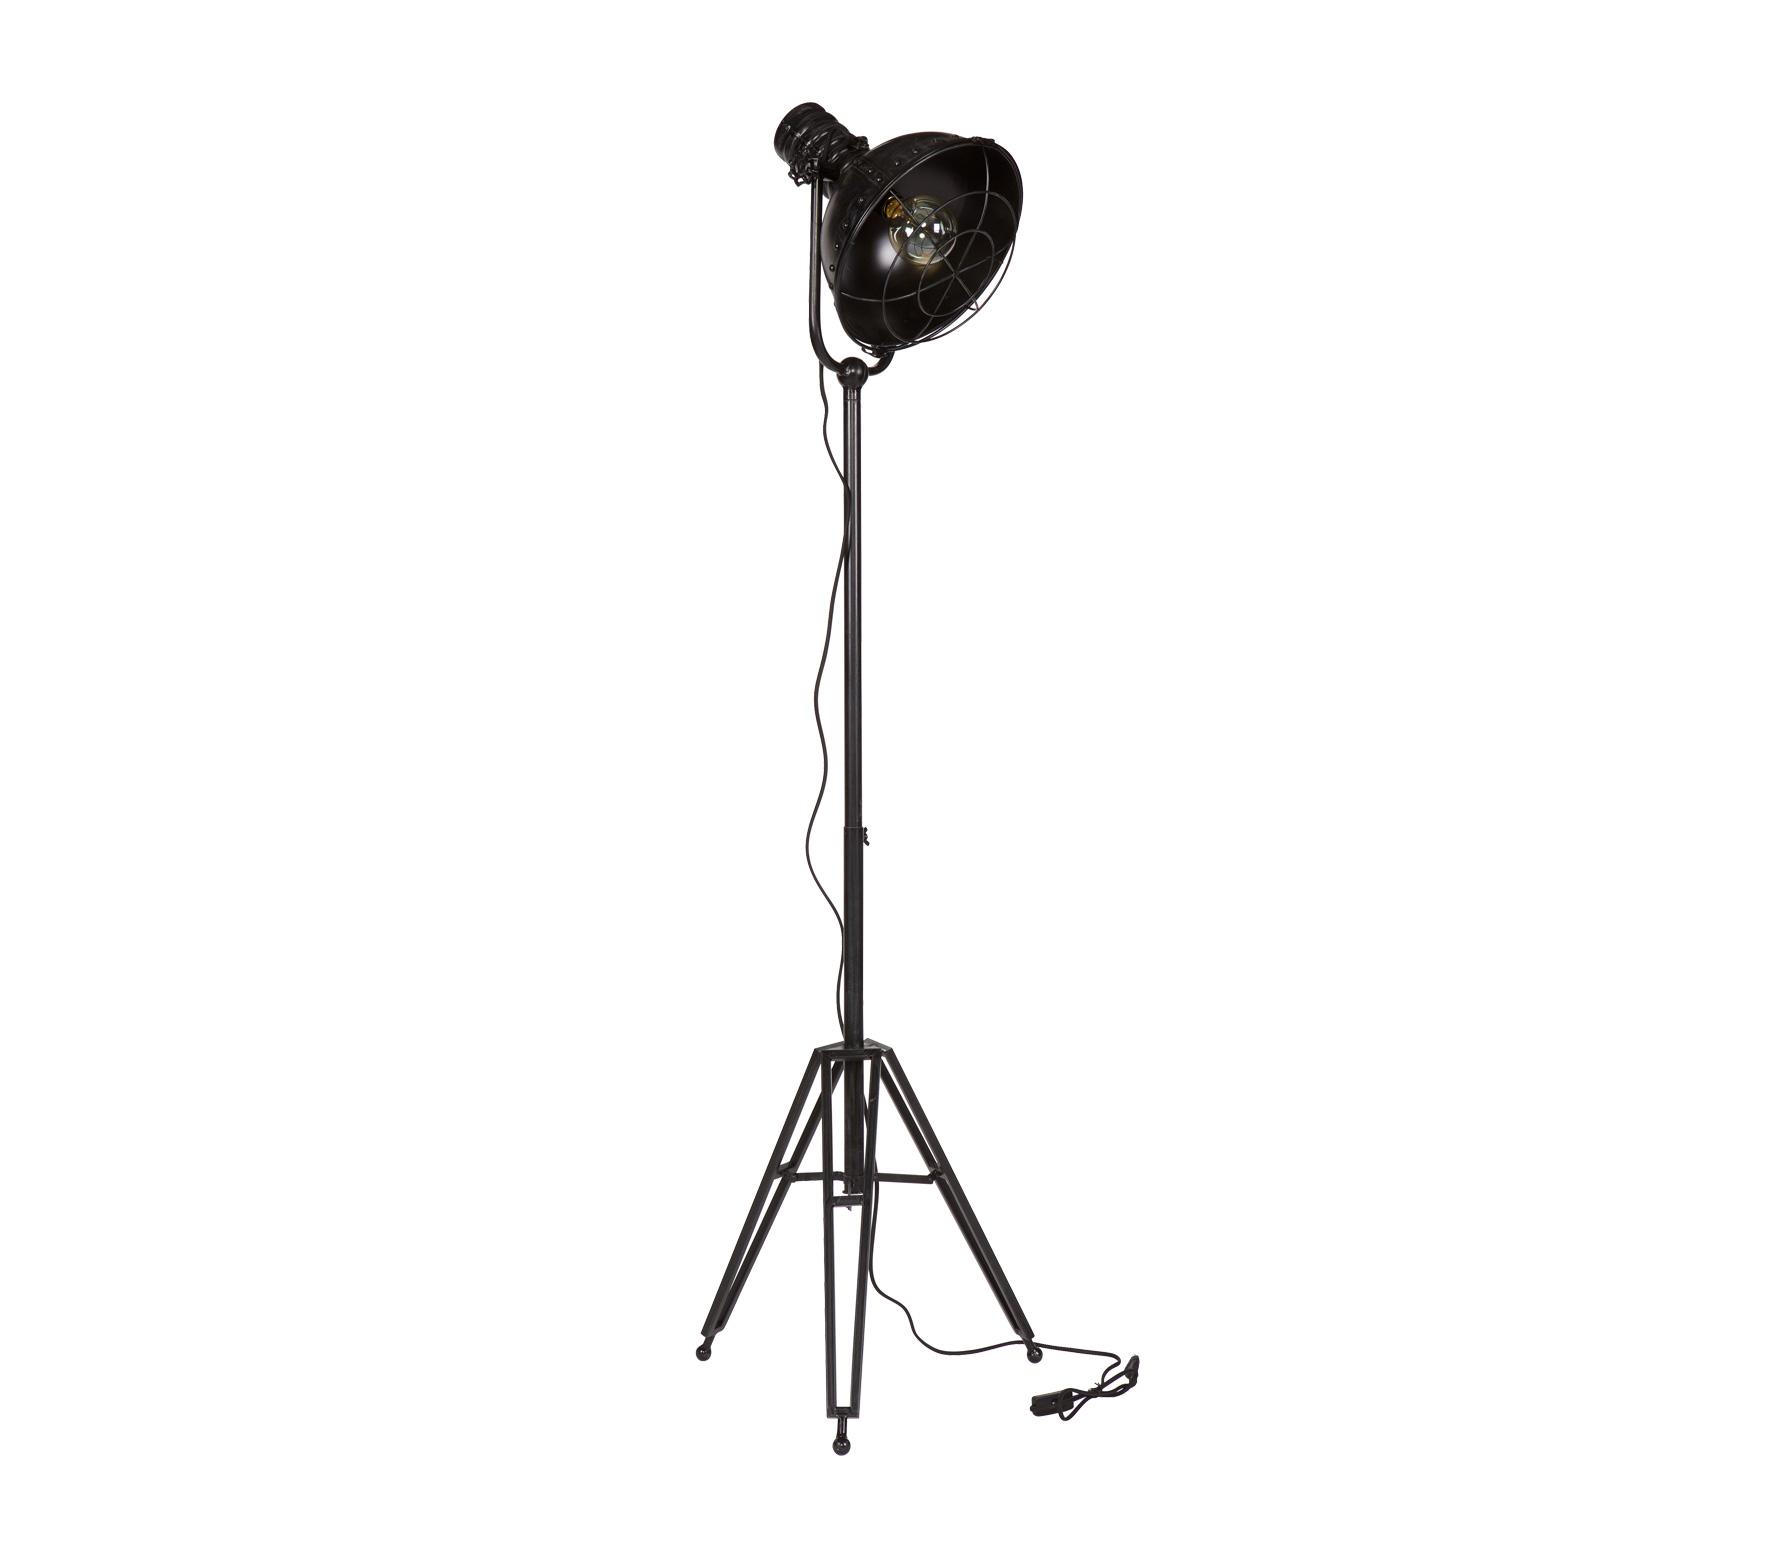 BePureHome Spotlight vintage vloerlamp metaal zwart